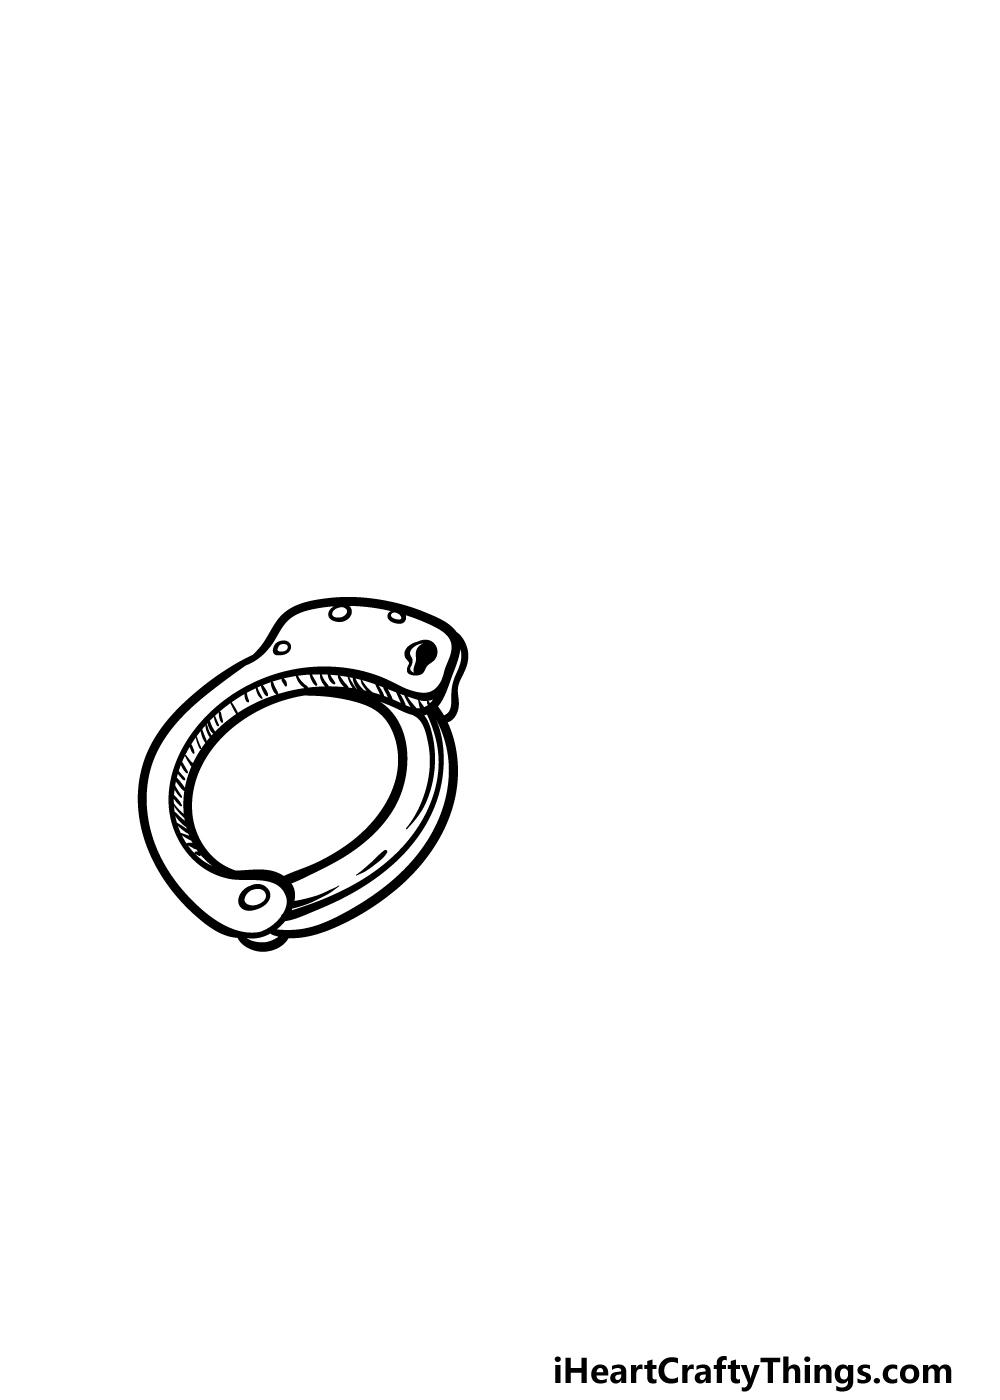 drawing handcuffs step 2